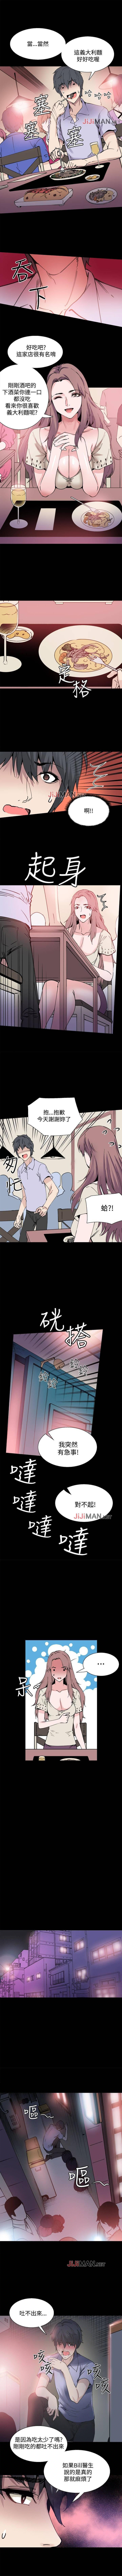 【已完结】Bodychange(作者:Seize & 死亡節奏) 第1~33话 37